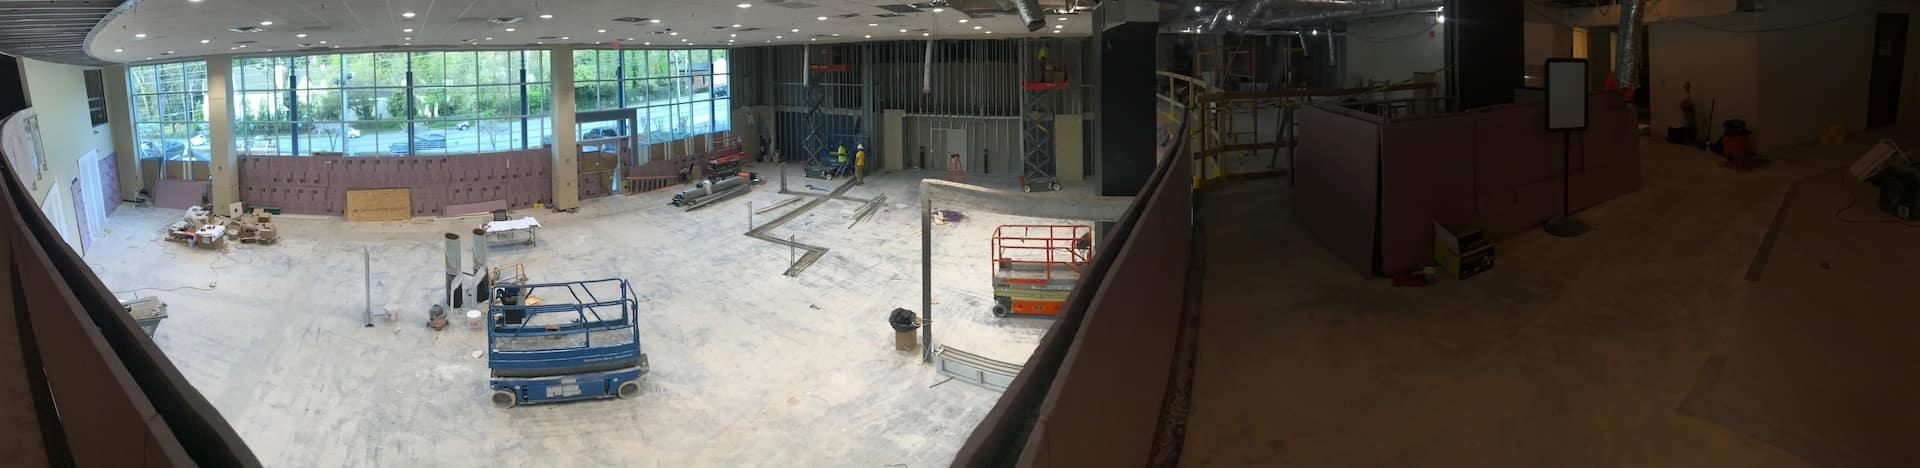 Renovation-Pt2